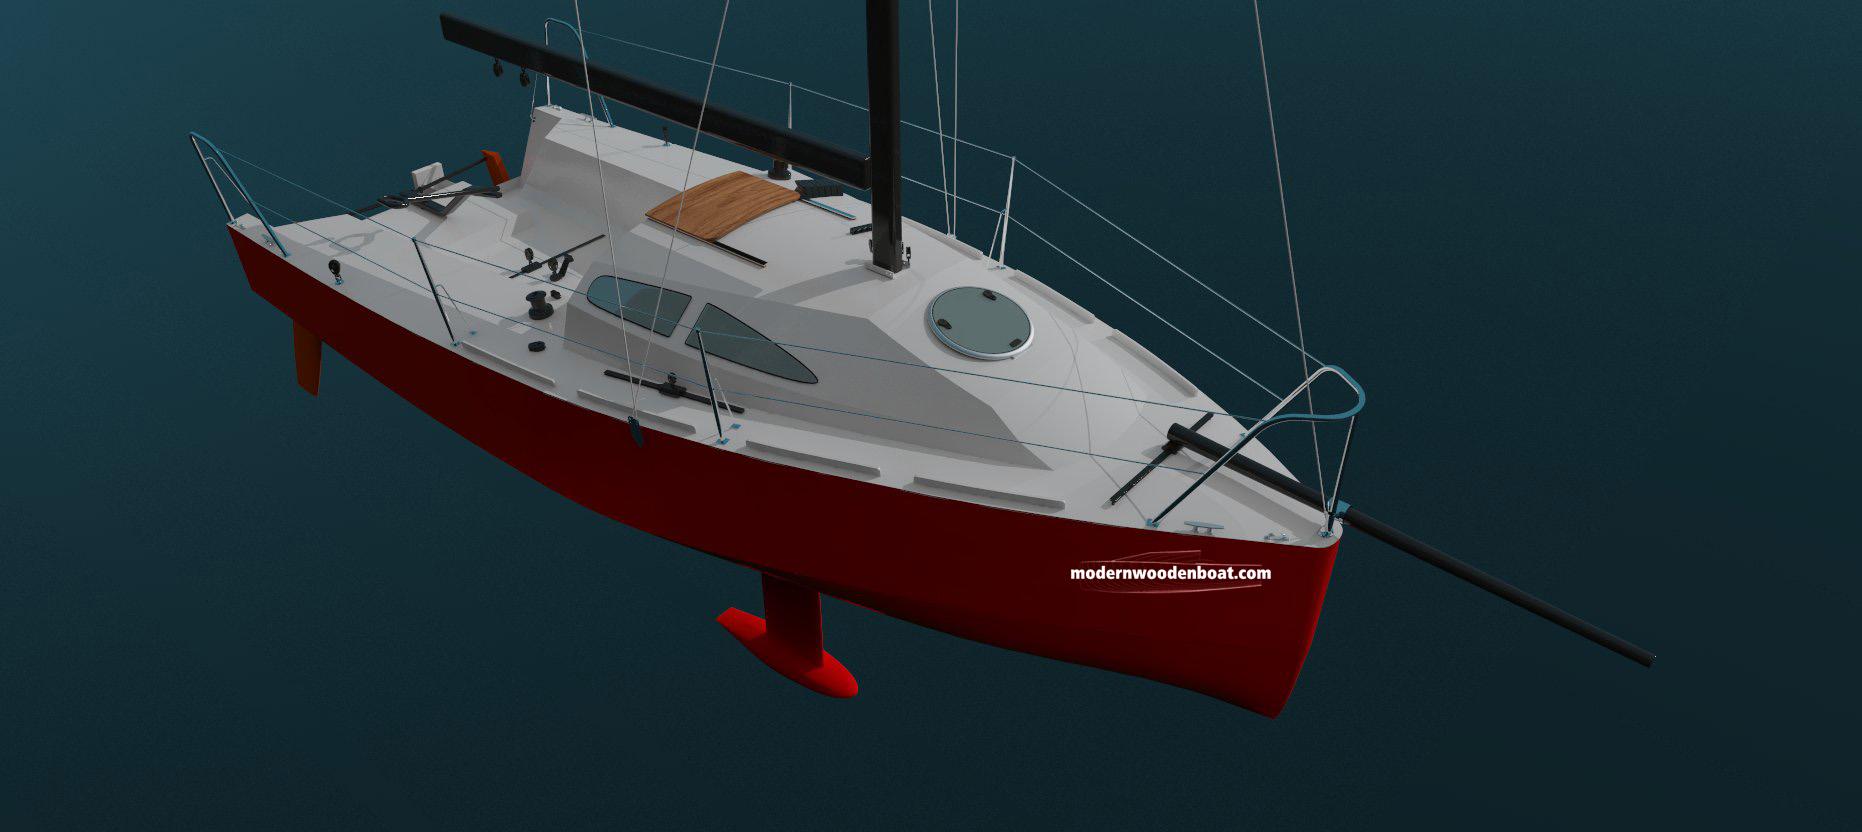 idea-21-radiuschine-epoxy-plywood-sportboat-05